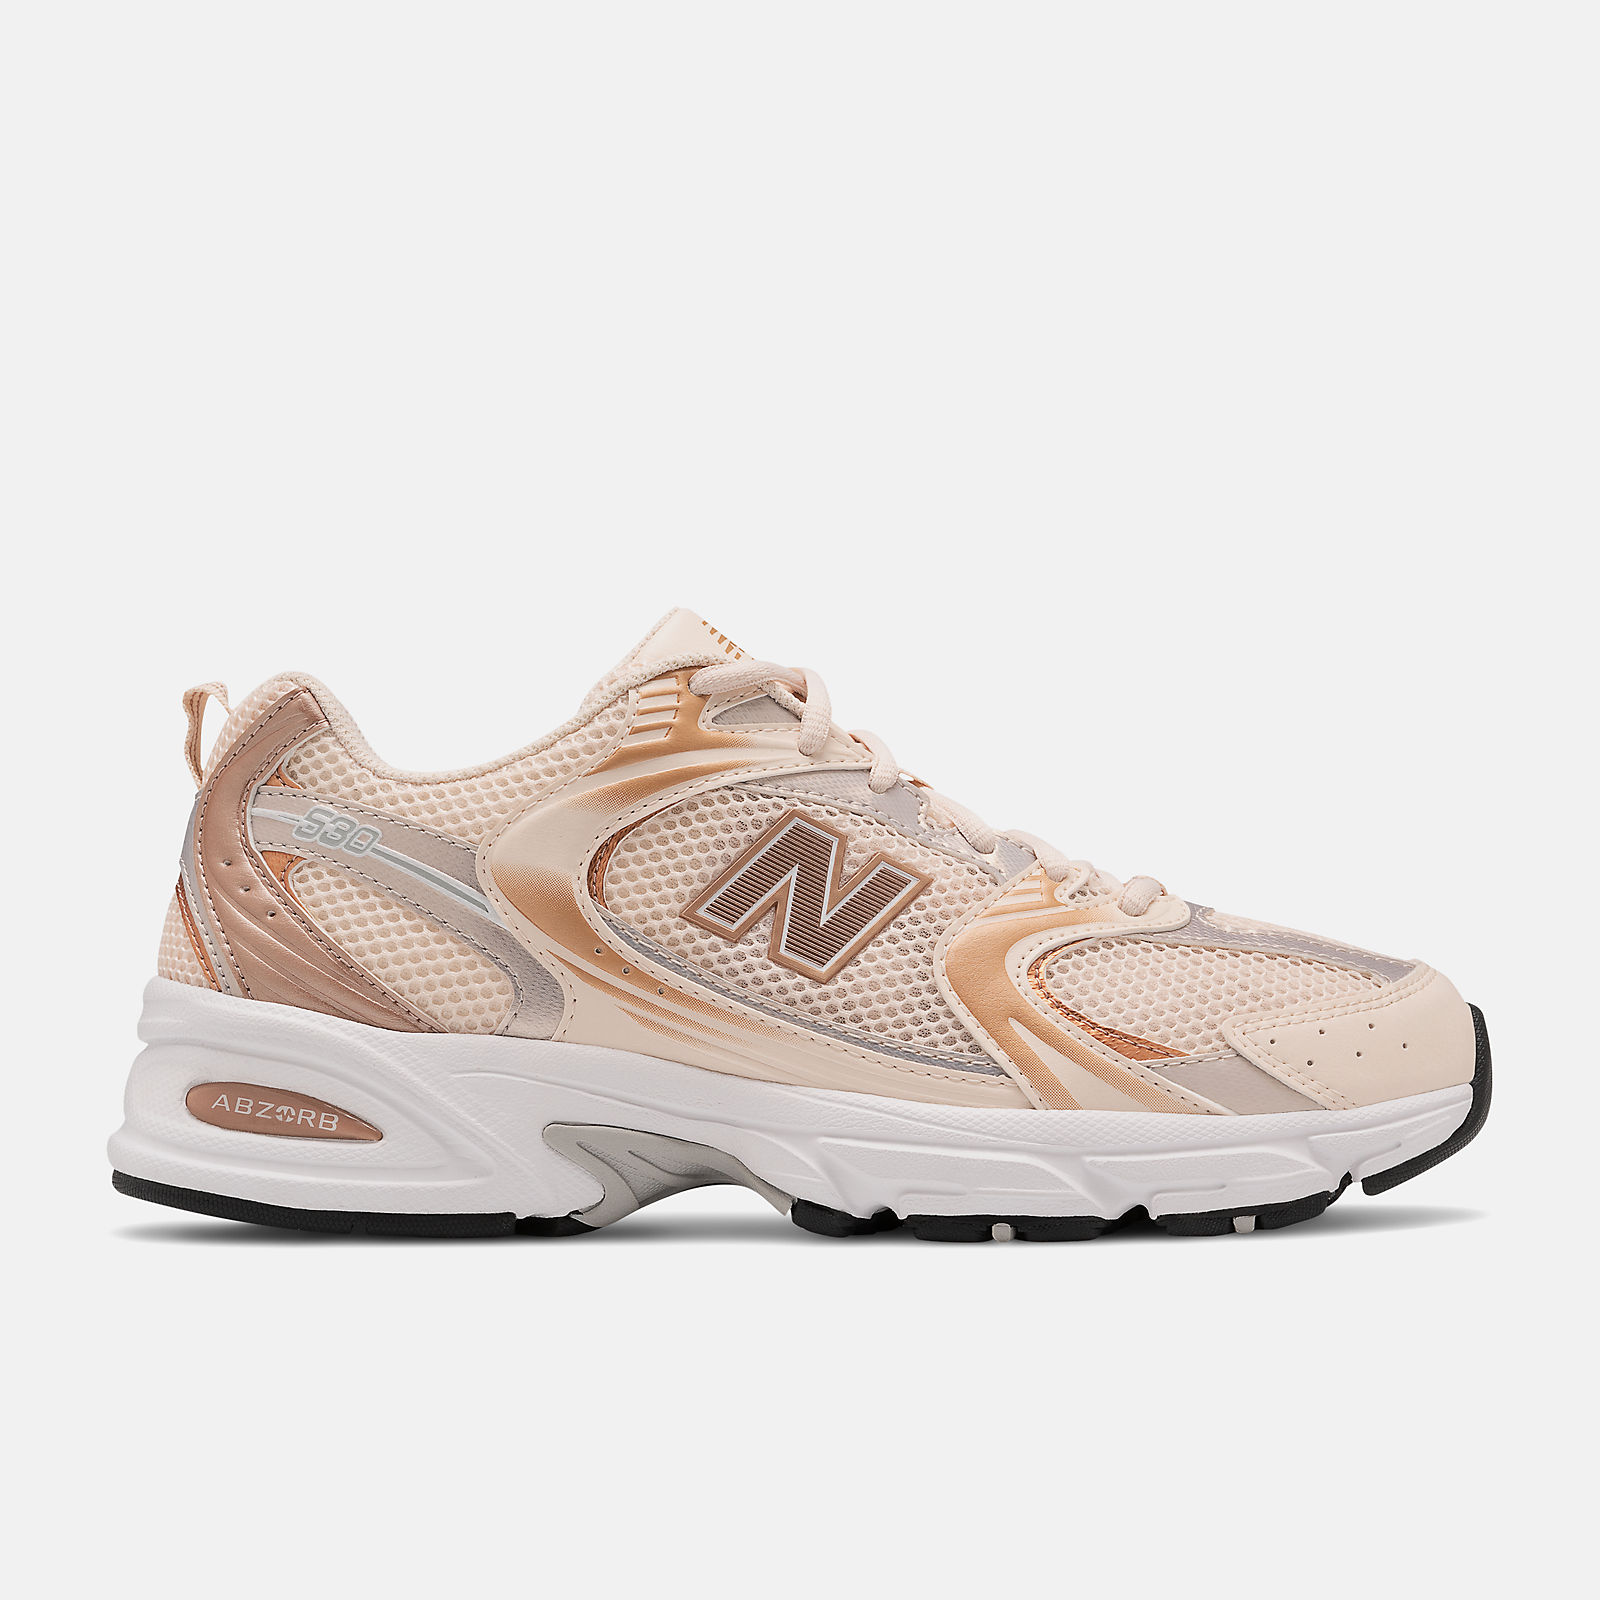 Chaussures de Course 530 - New Balance